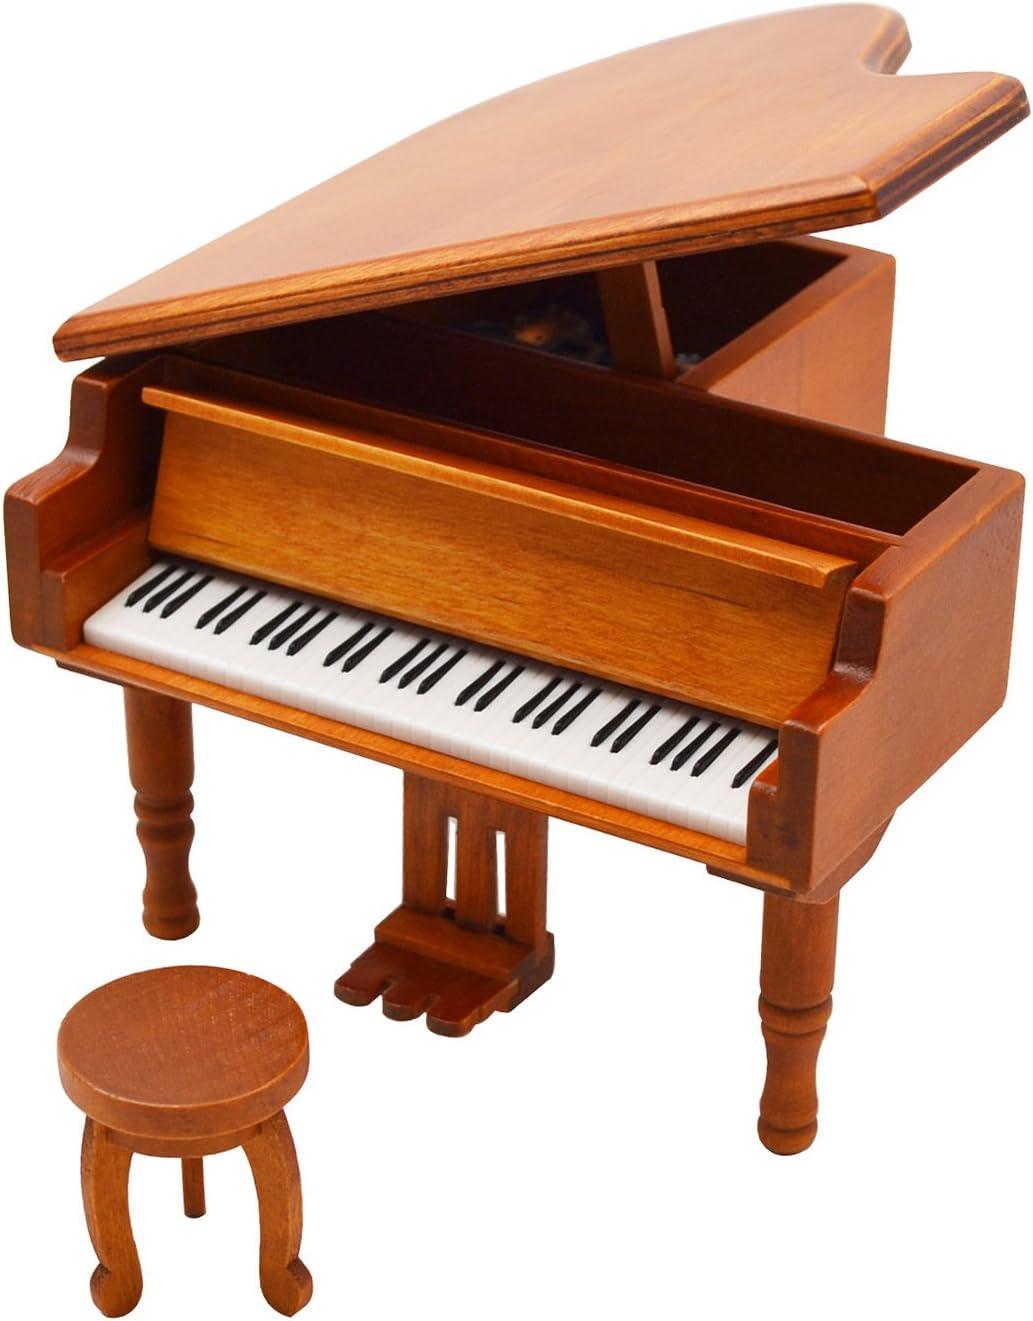 Sound Harbor Piano Model Music Box For Music Lover (Orangered-Piano)